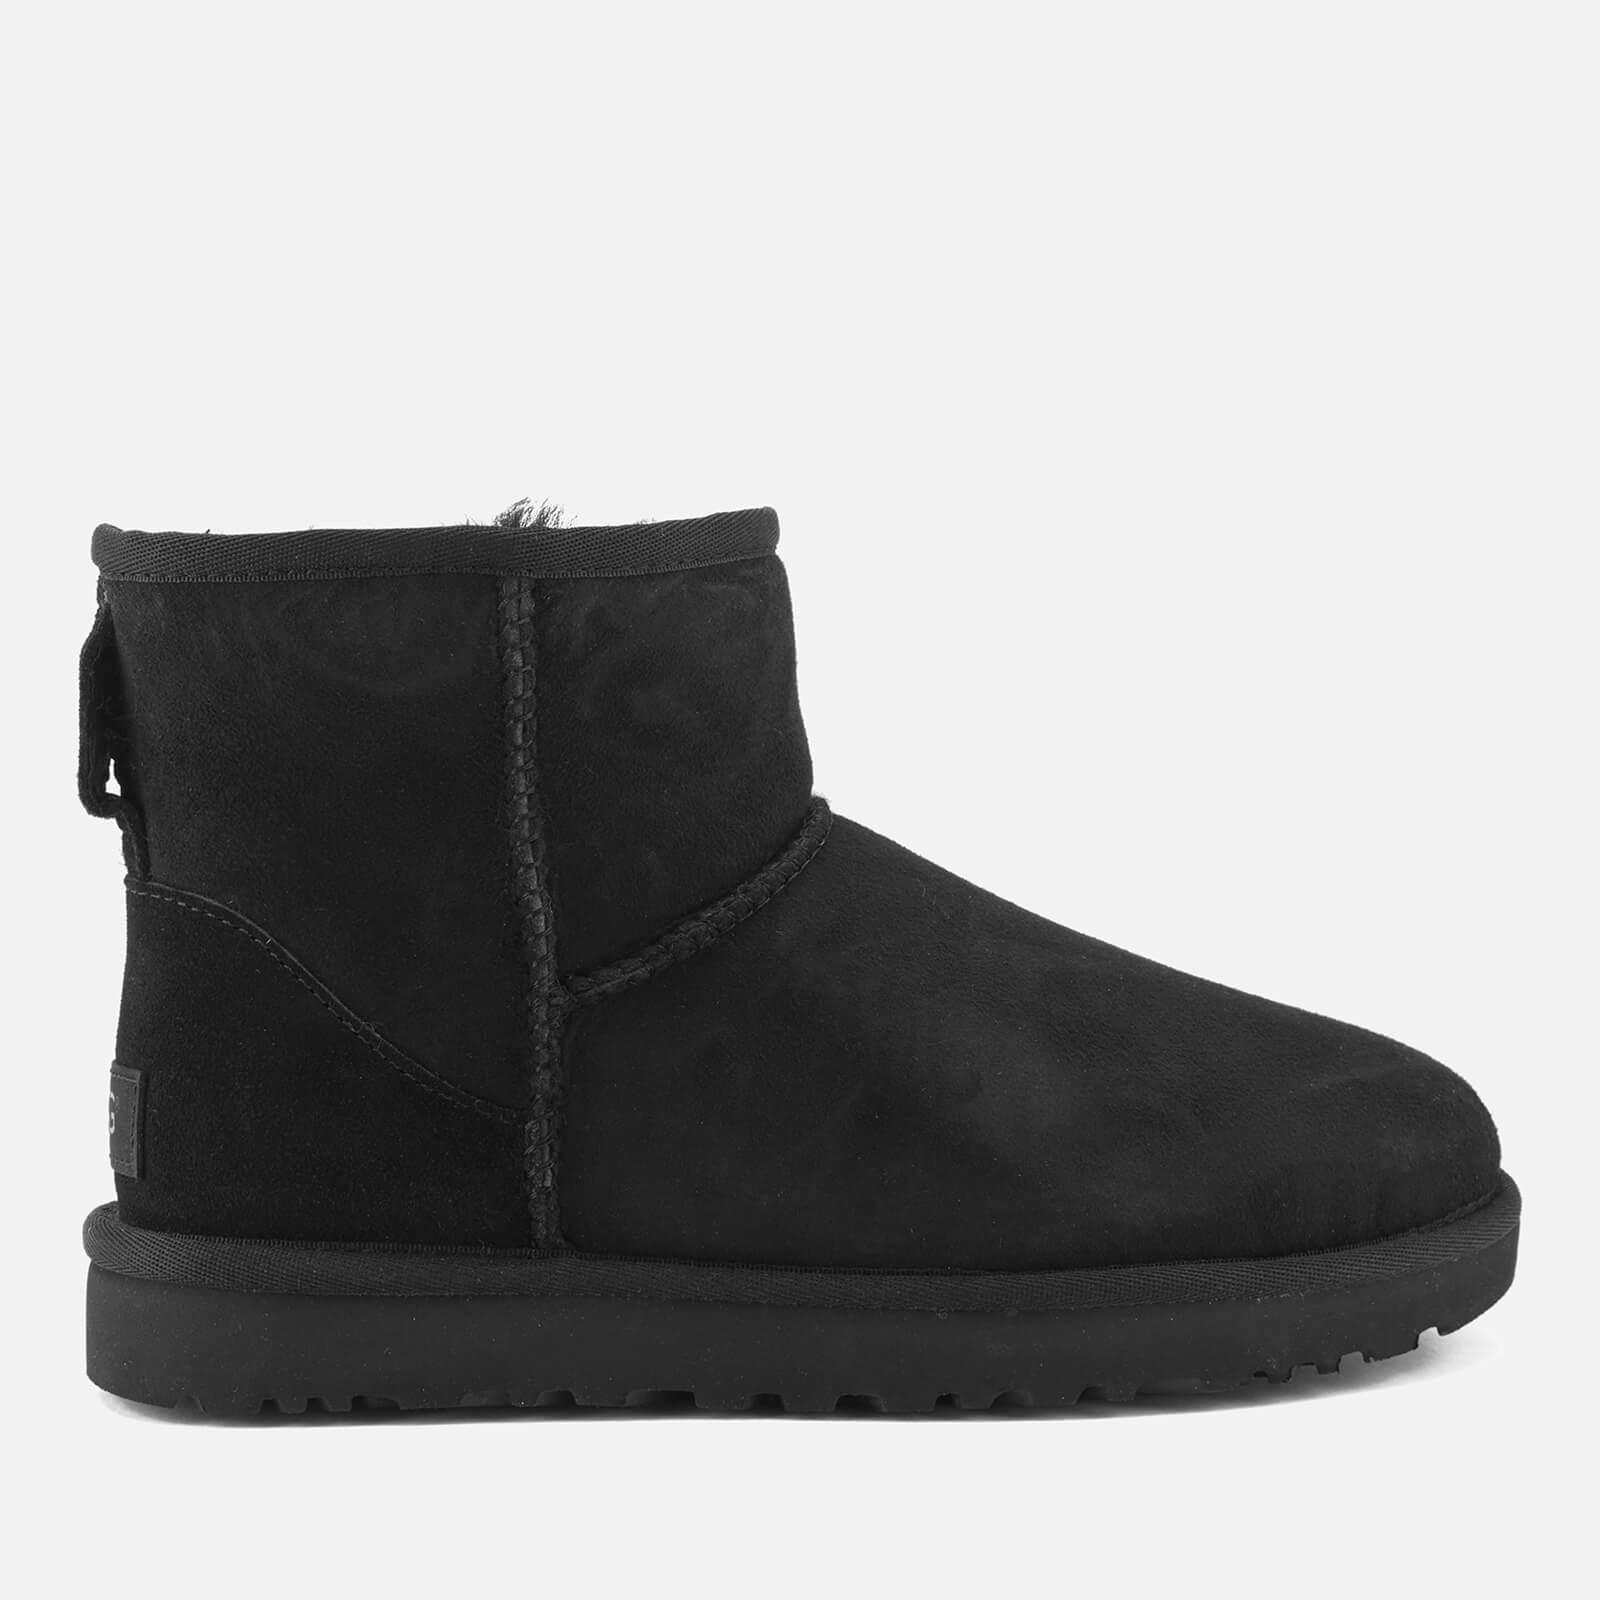 ffec3da4df ... sweden ugg womens classic mini ii sheepskin boots black free uk ugg  kids mini bailey 9f8dd ...